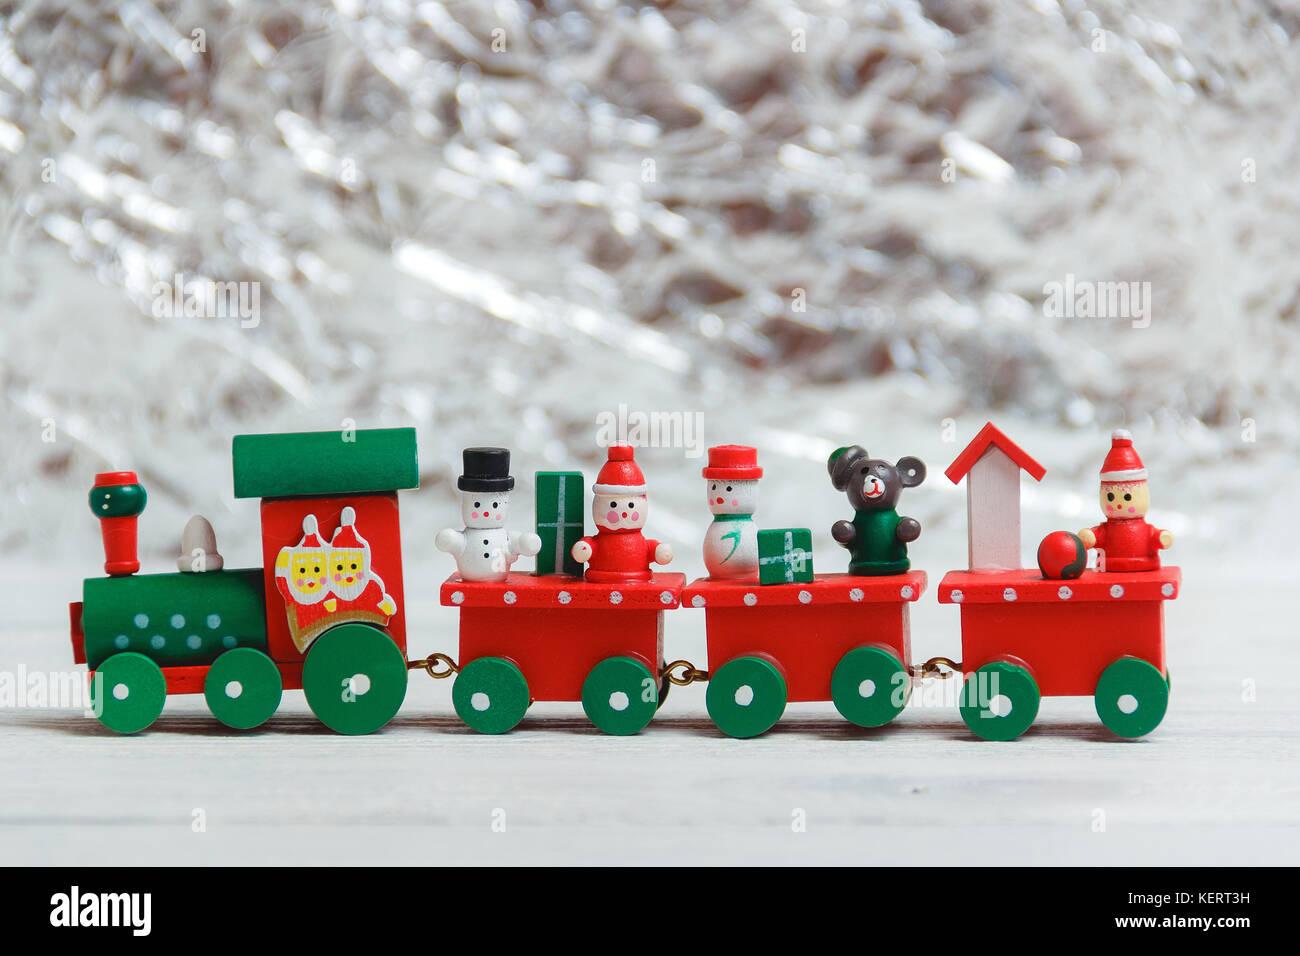 Toy train christmas stock photos